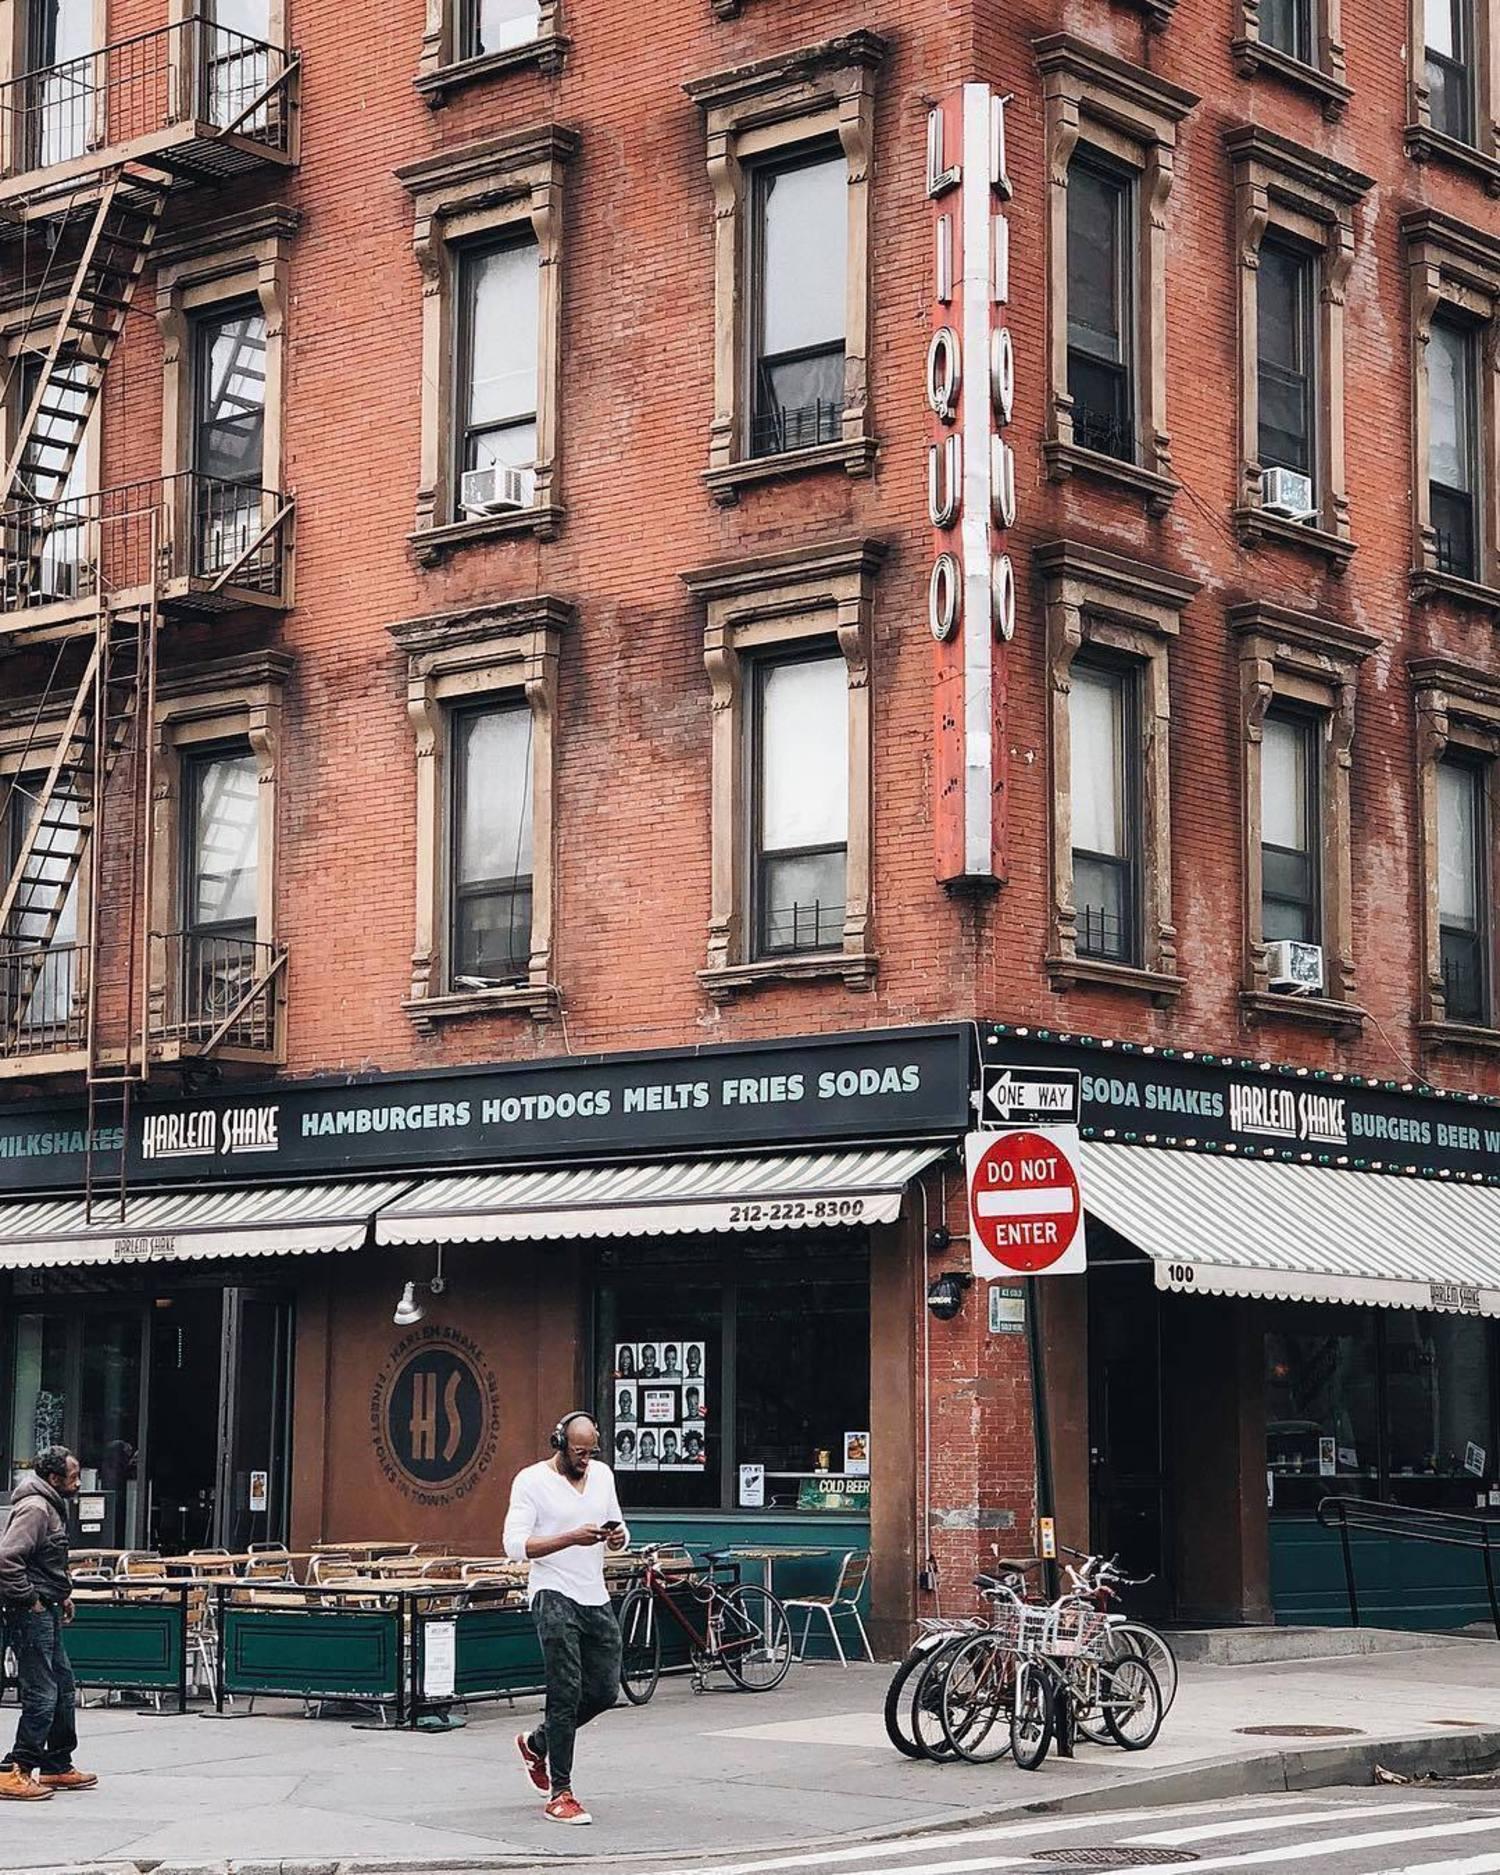 Harlem, Manhattan. Photo via @melliekr #viewingnyc #newyork #newyorkcity #nyc